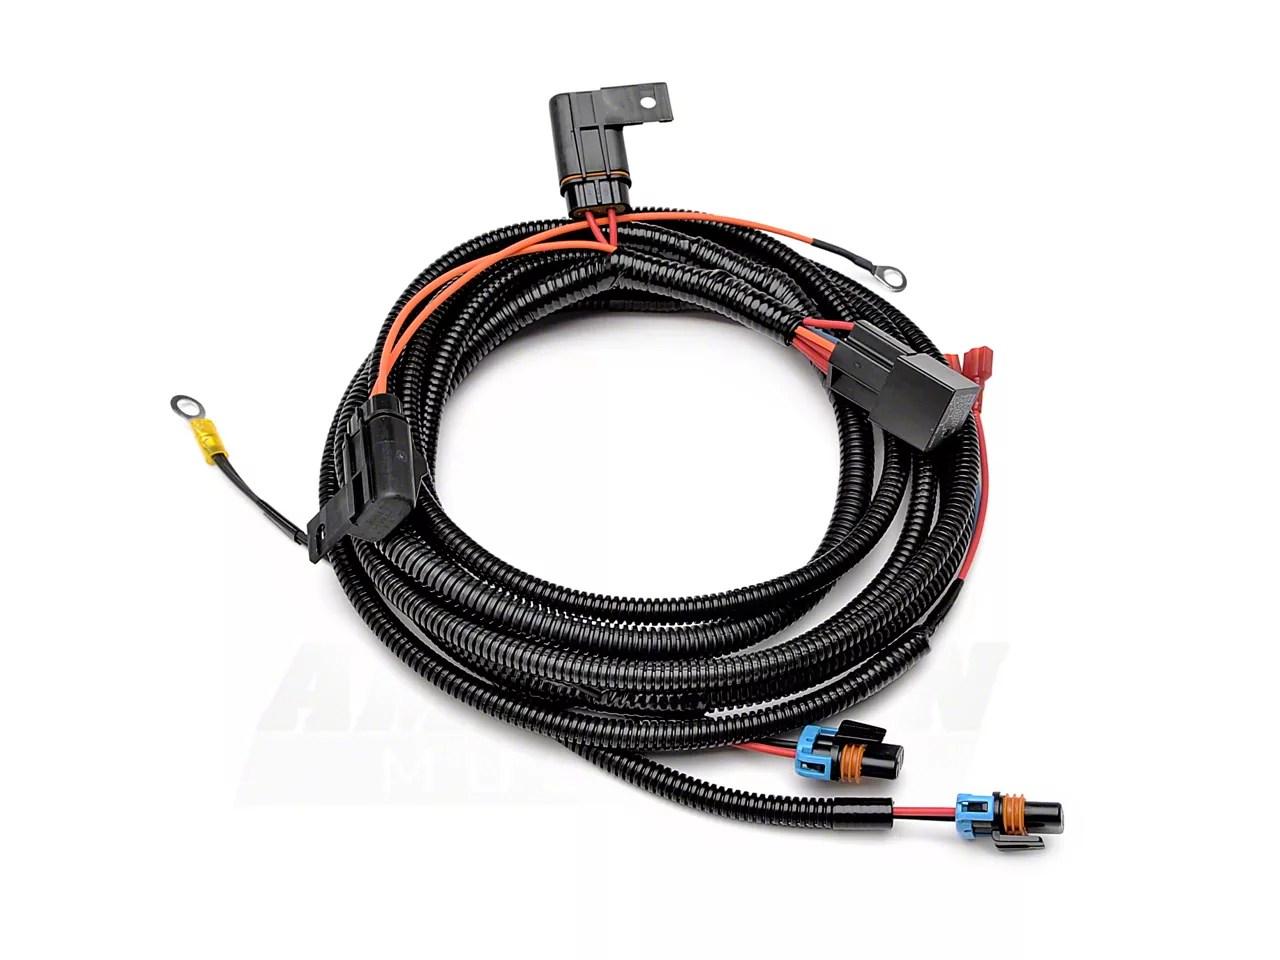 Raxiom Mustang Fog Light Harness 68123 05 09 V6 Free Shipping